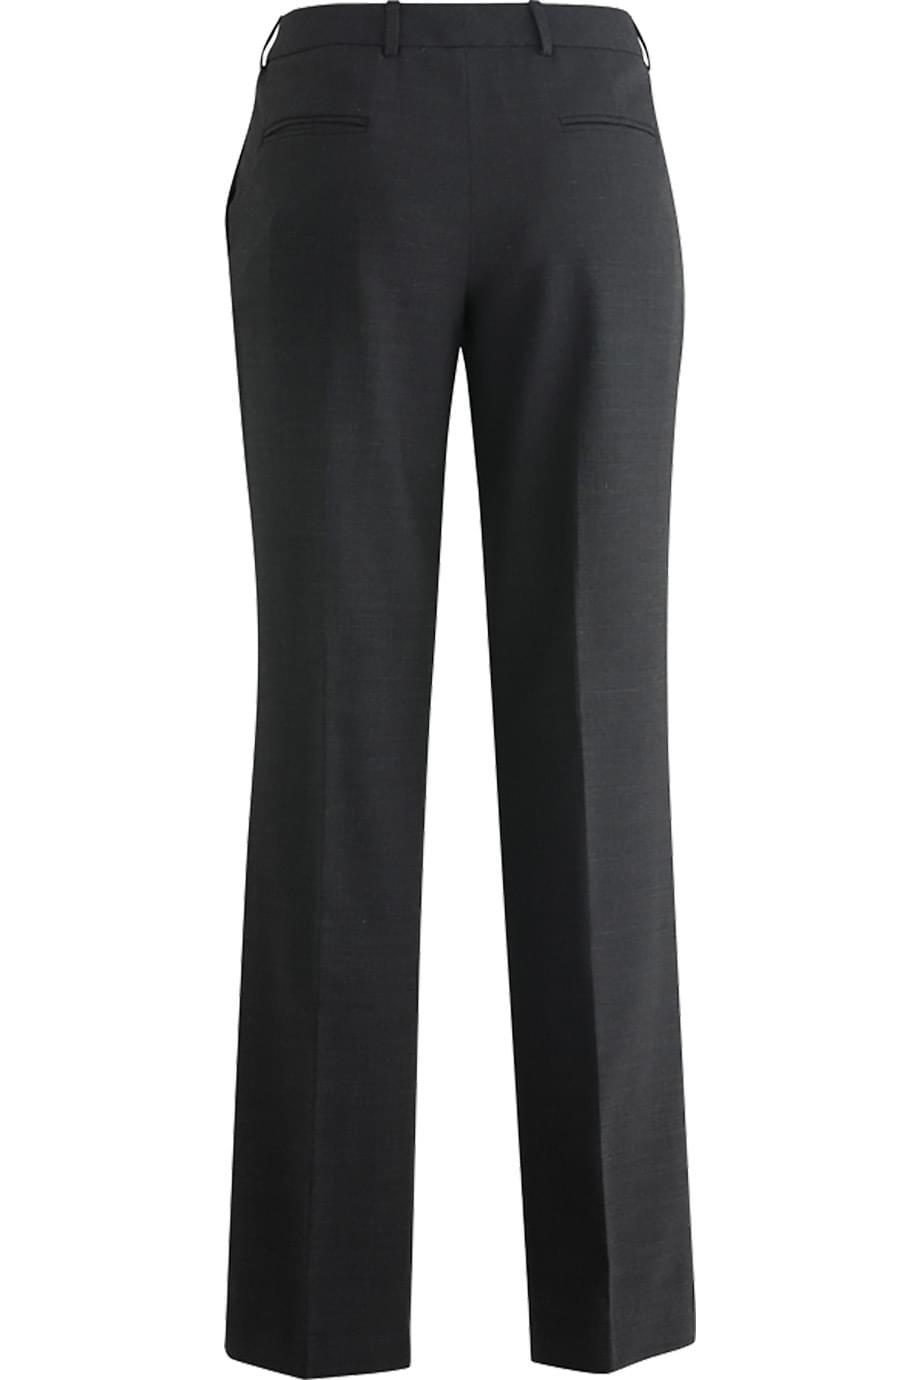 REDWOOD & ROSS® RUSSEL DRESS PANT